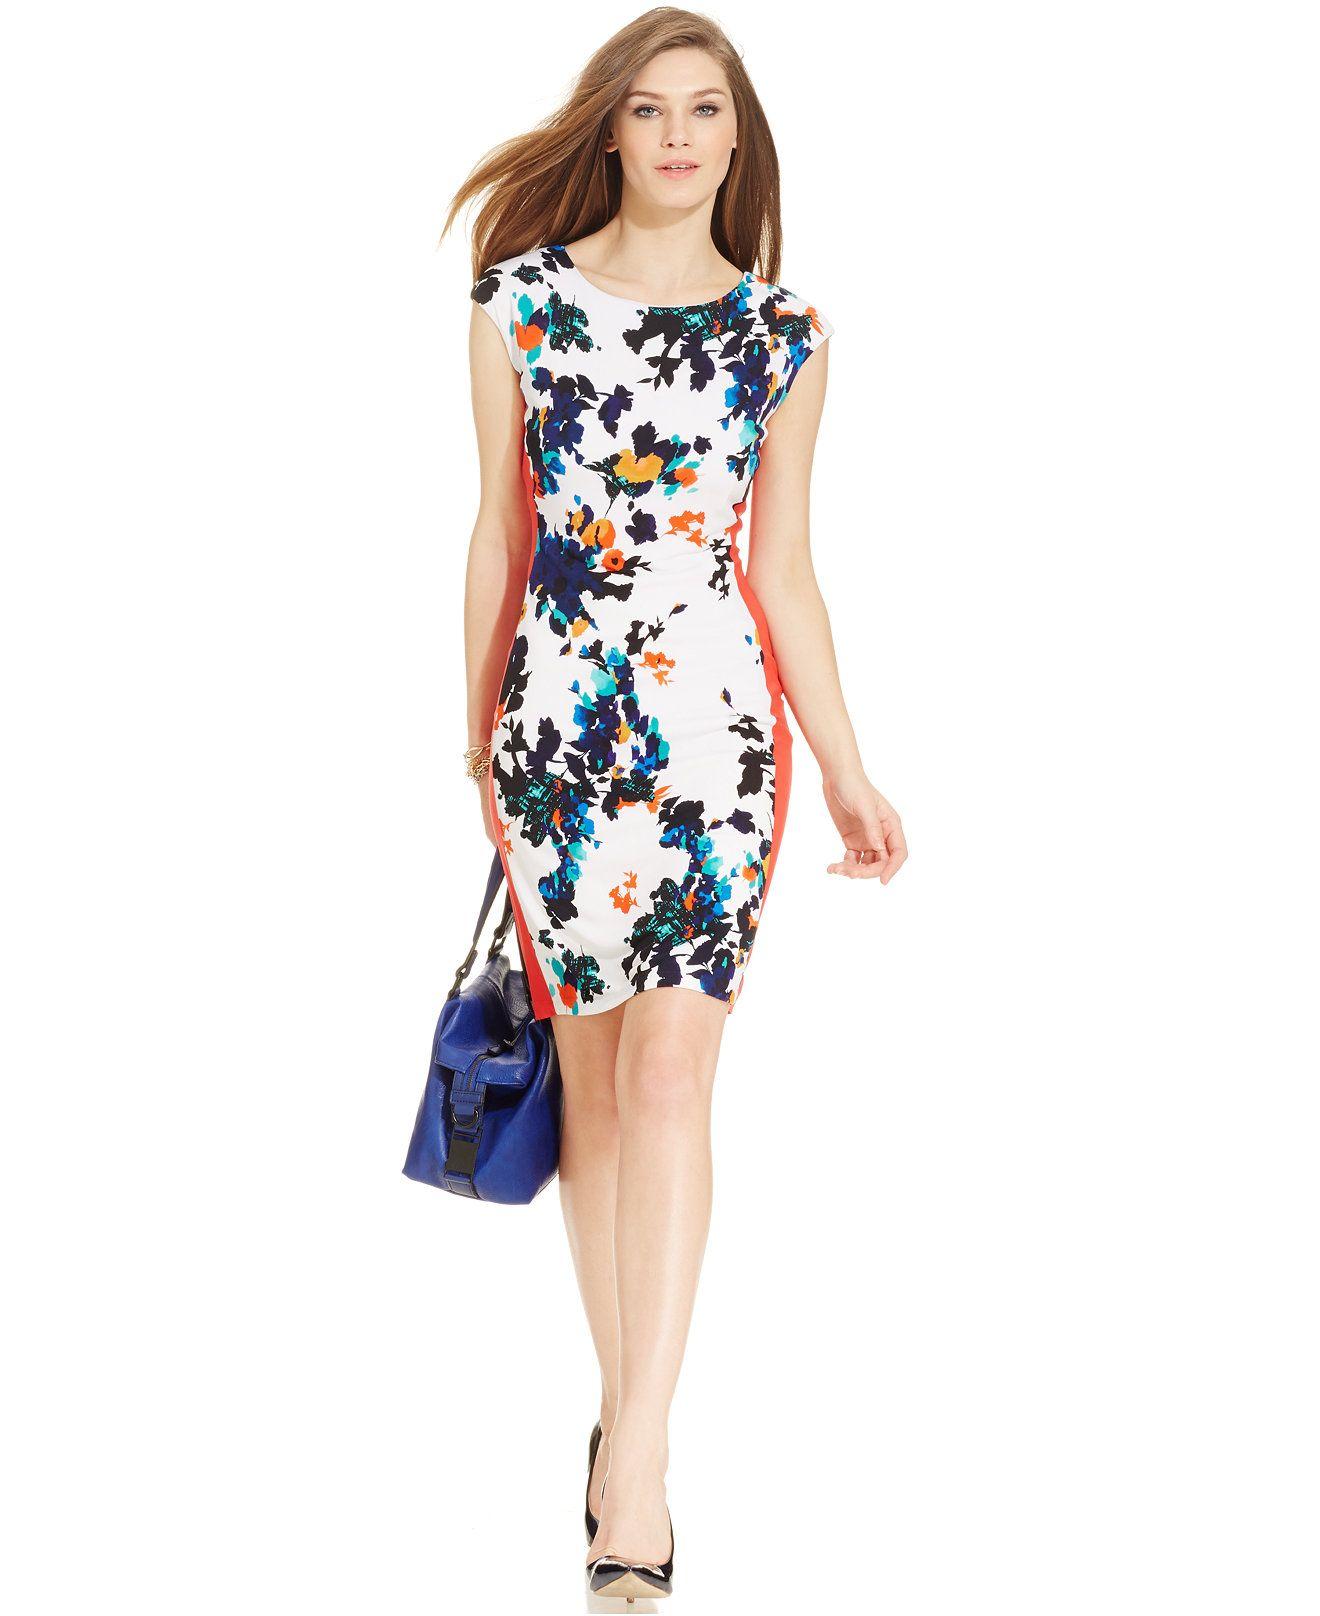 Ronni nicole capsleeve floral colorblock sheath dresses